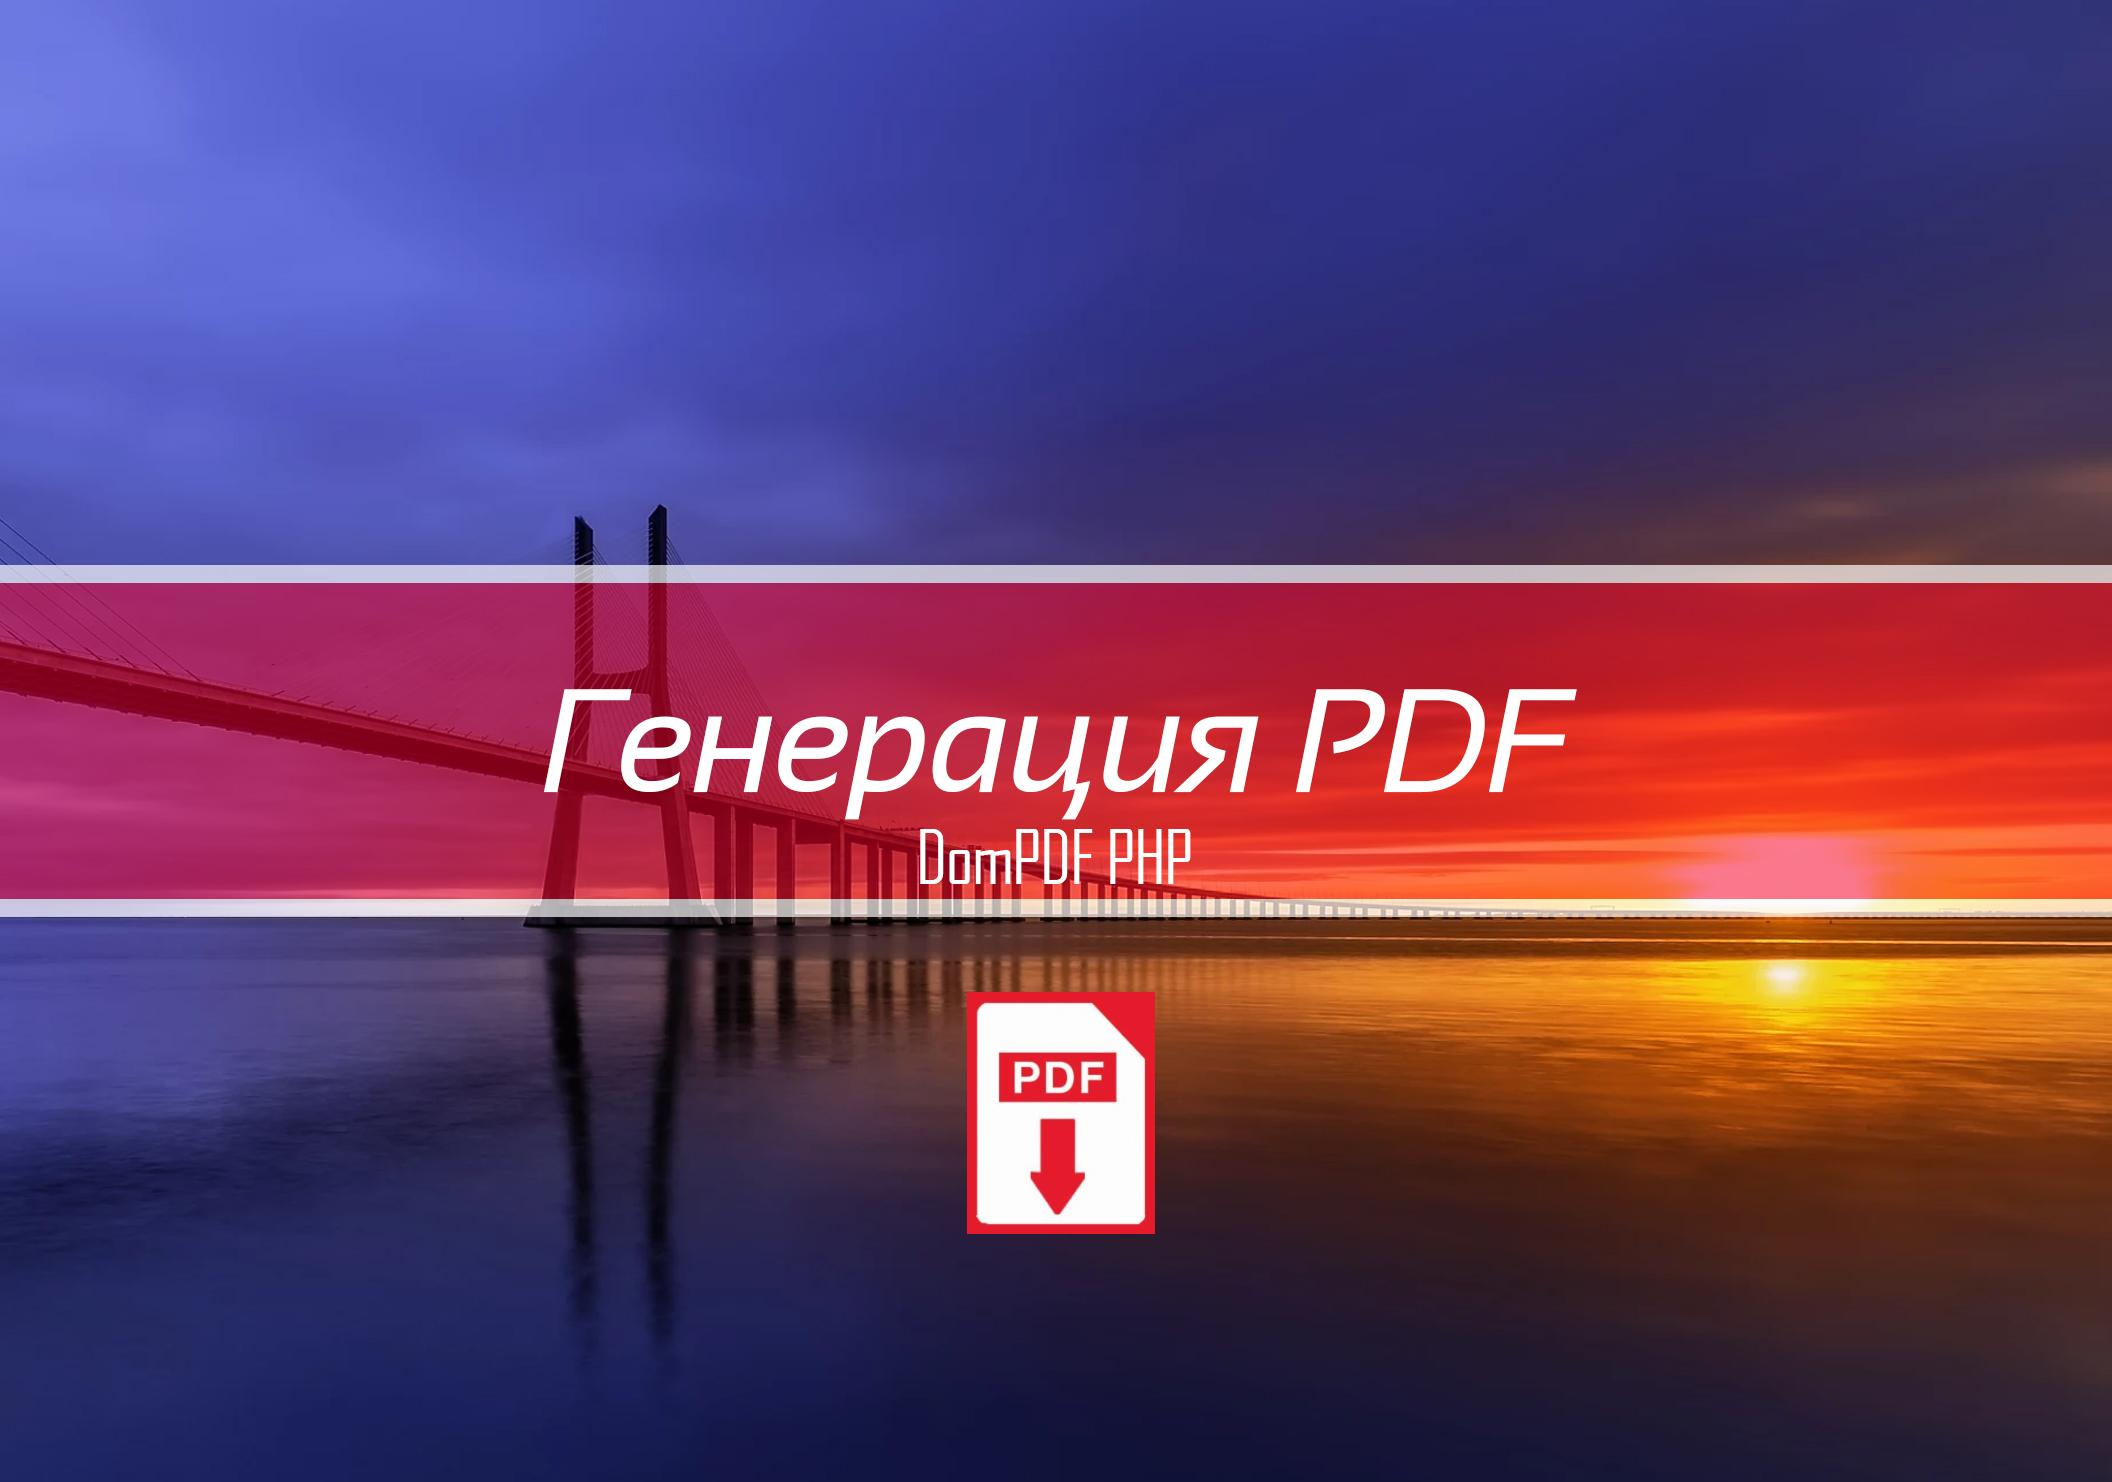 Генерация PDF. DomPDF PHP